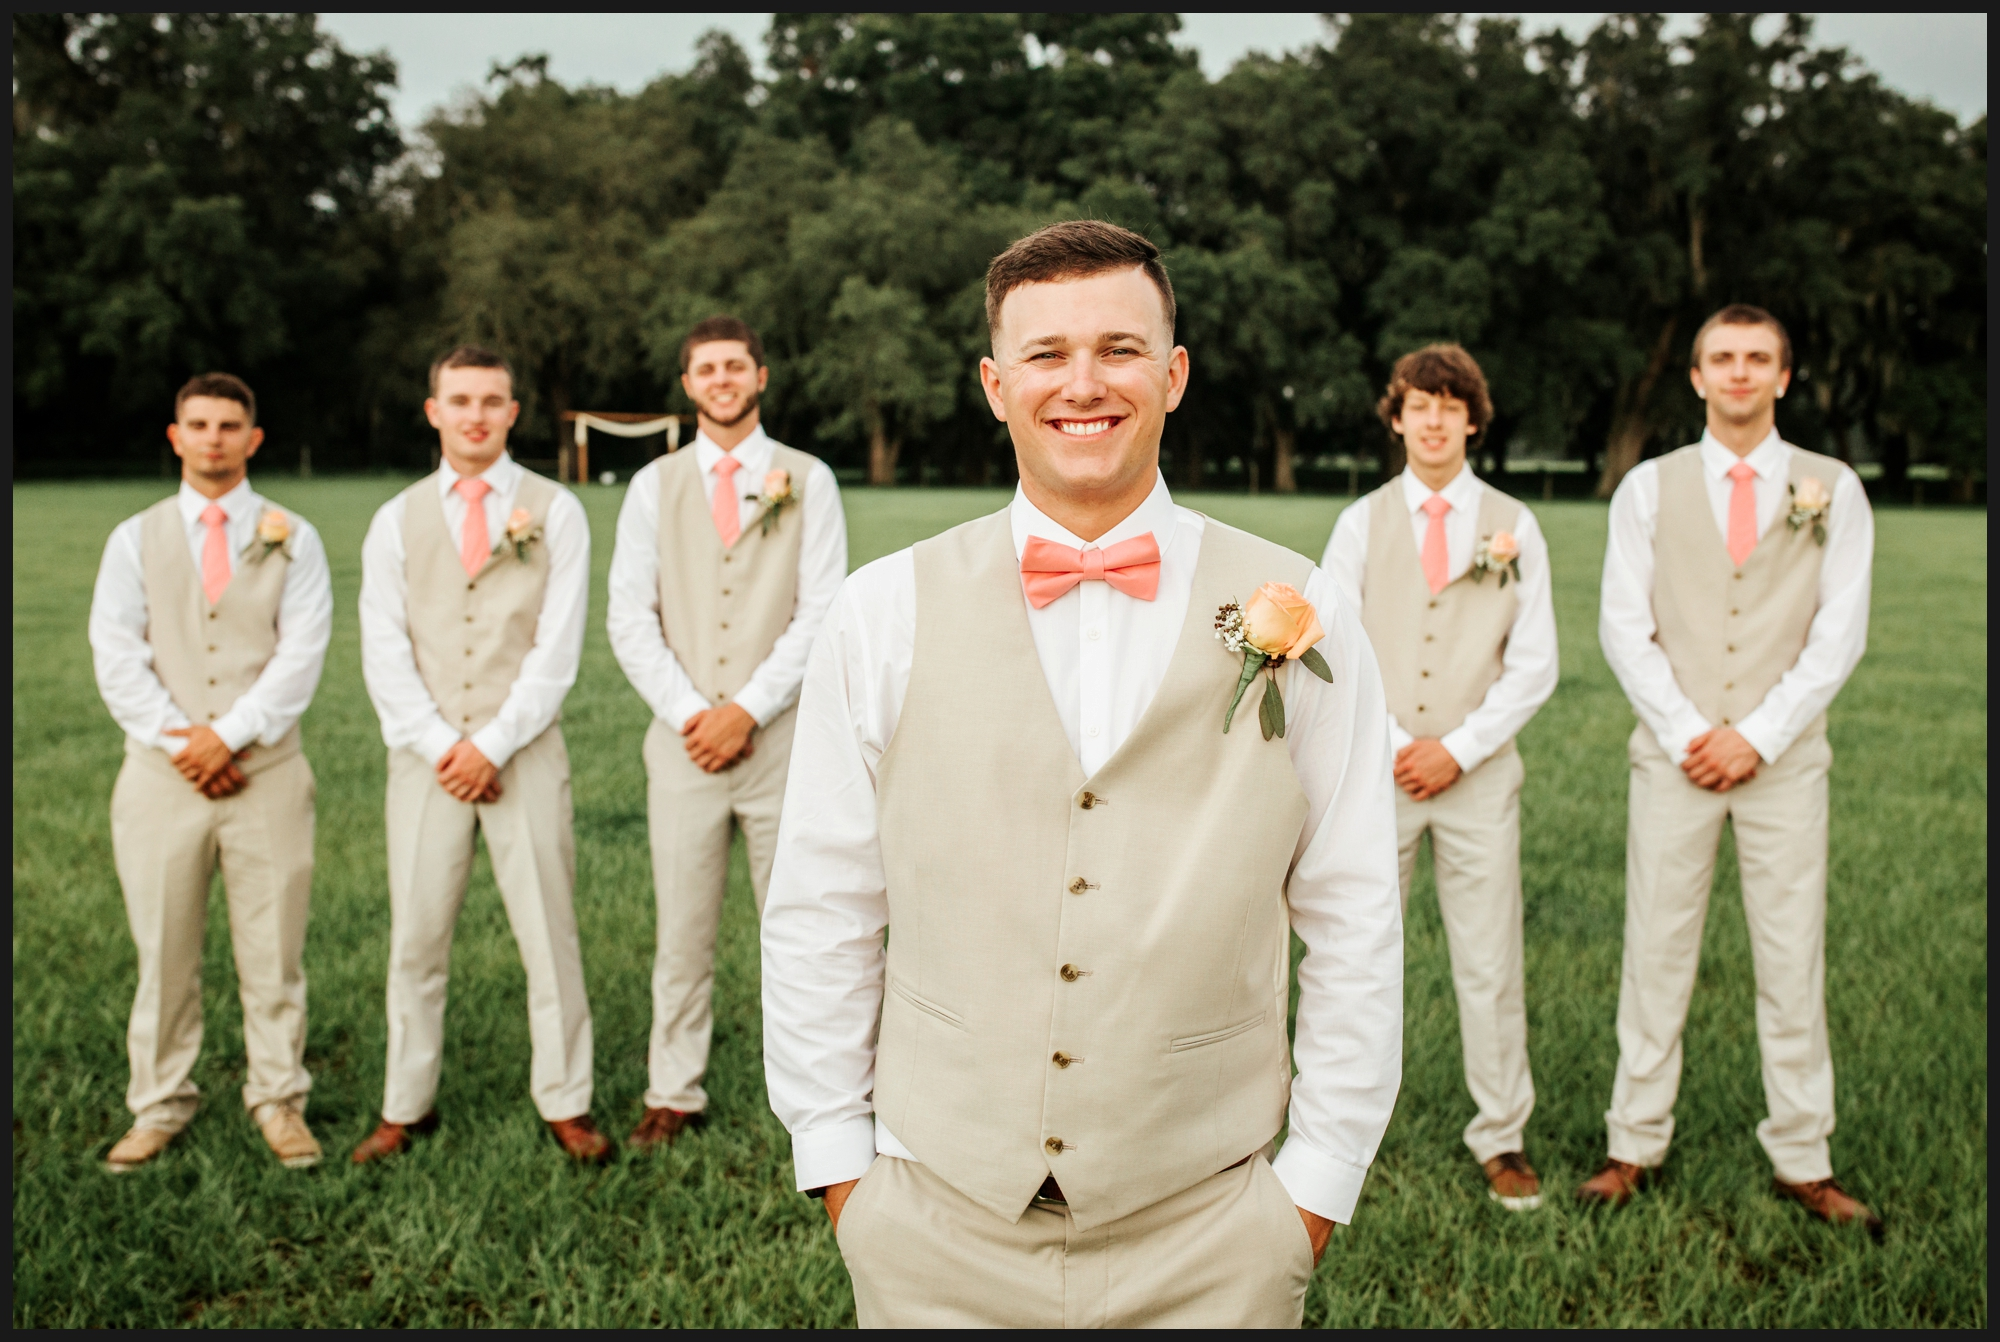 Orlando-Wedding-Photographer-destination-wedding-photographer-florida-wedding-photographer-hawaii-wedding-photographer_0319.jpg